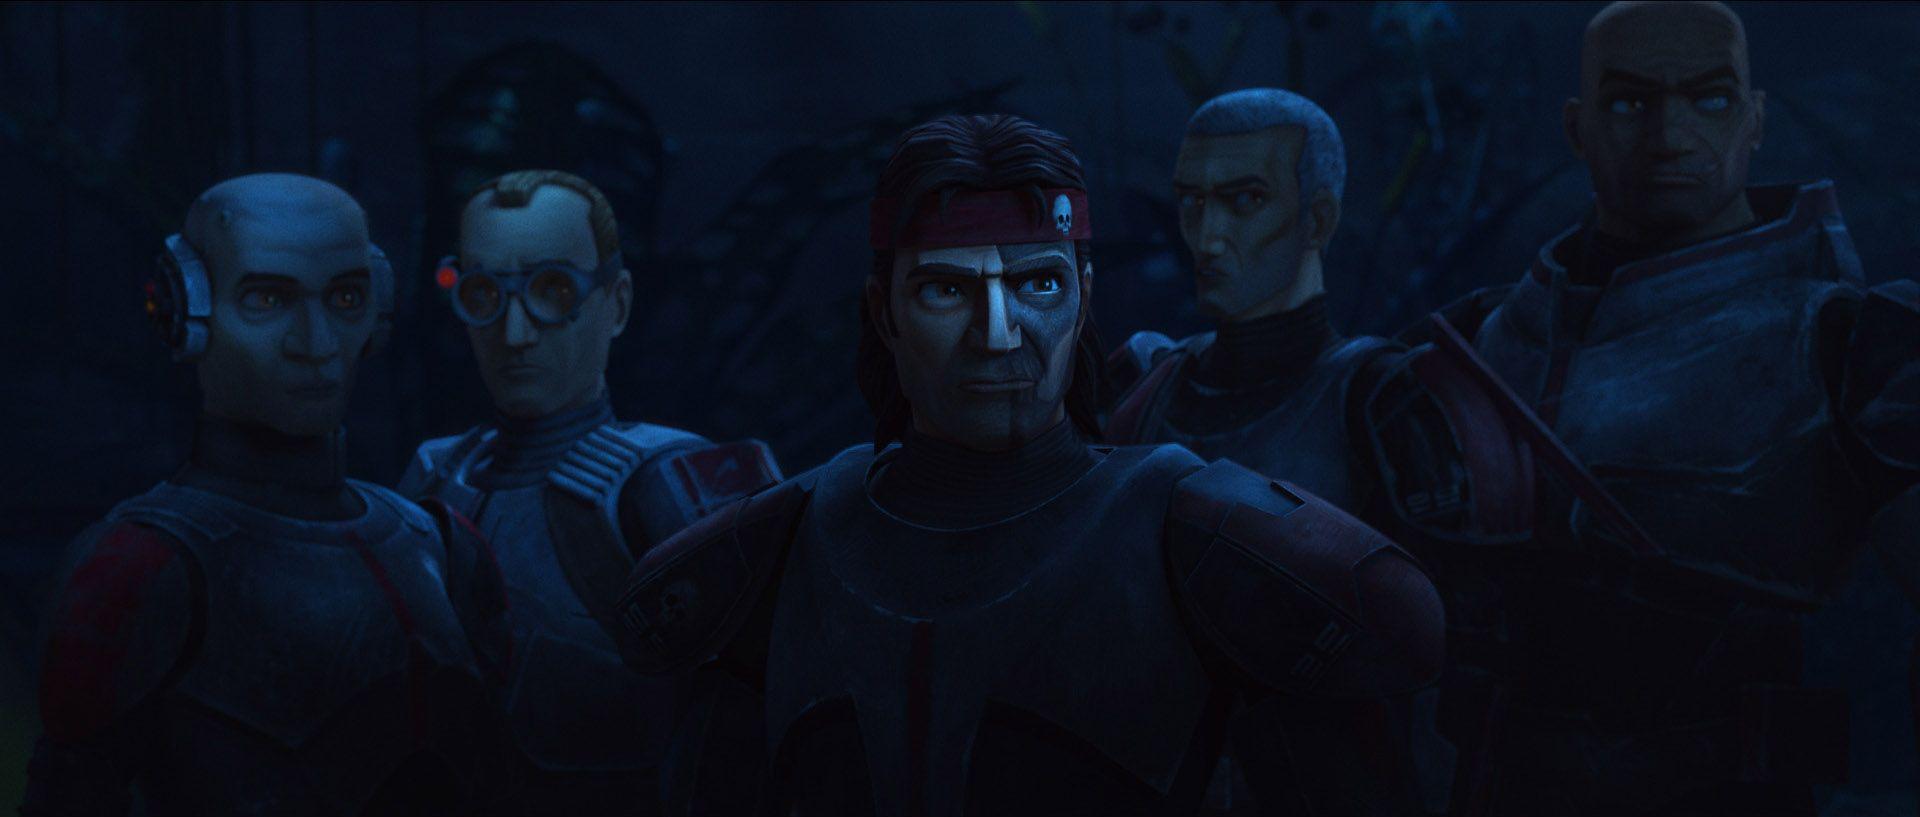 Star Wars: The Bad Batch recensione serie animata Lucasfilm su Disney+